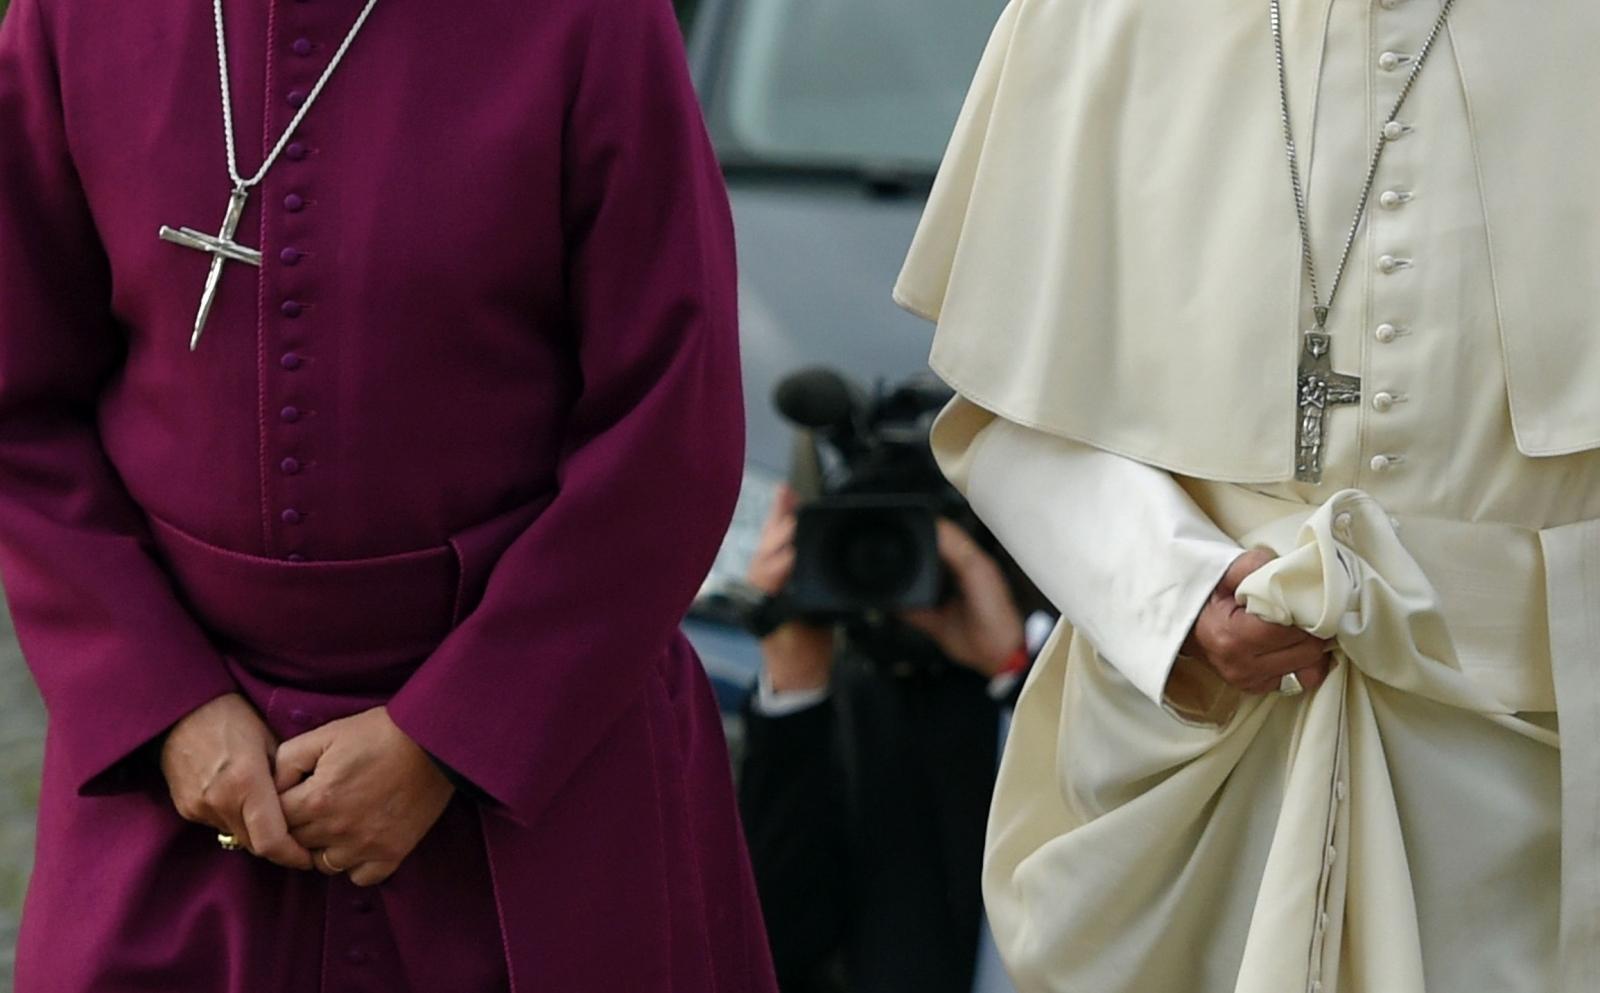 archbishop canterbury pope